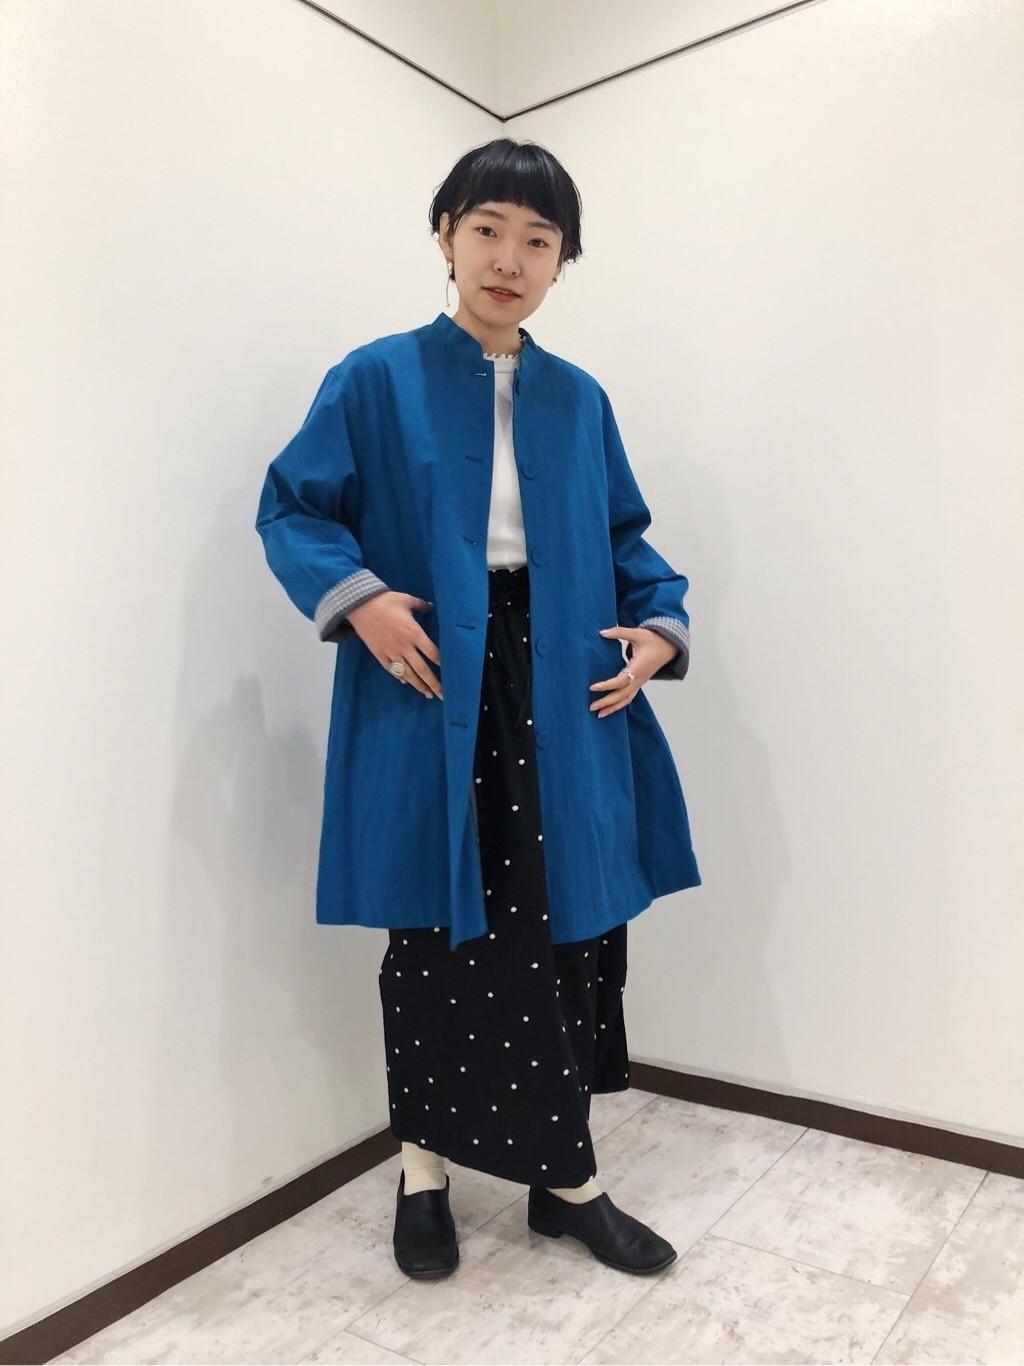 bulle de savon 新宿ミロード 身長:159cm 2020.01.21